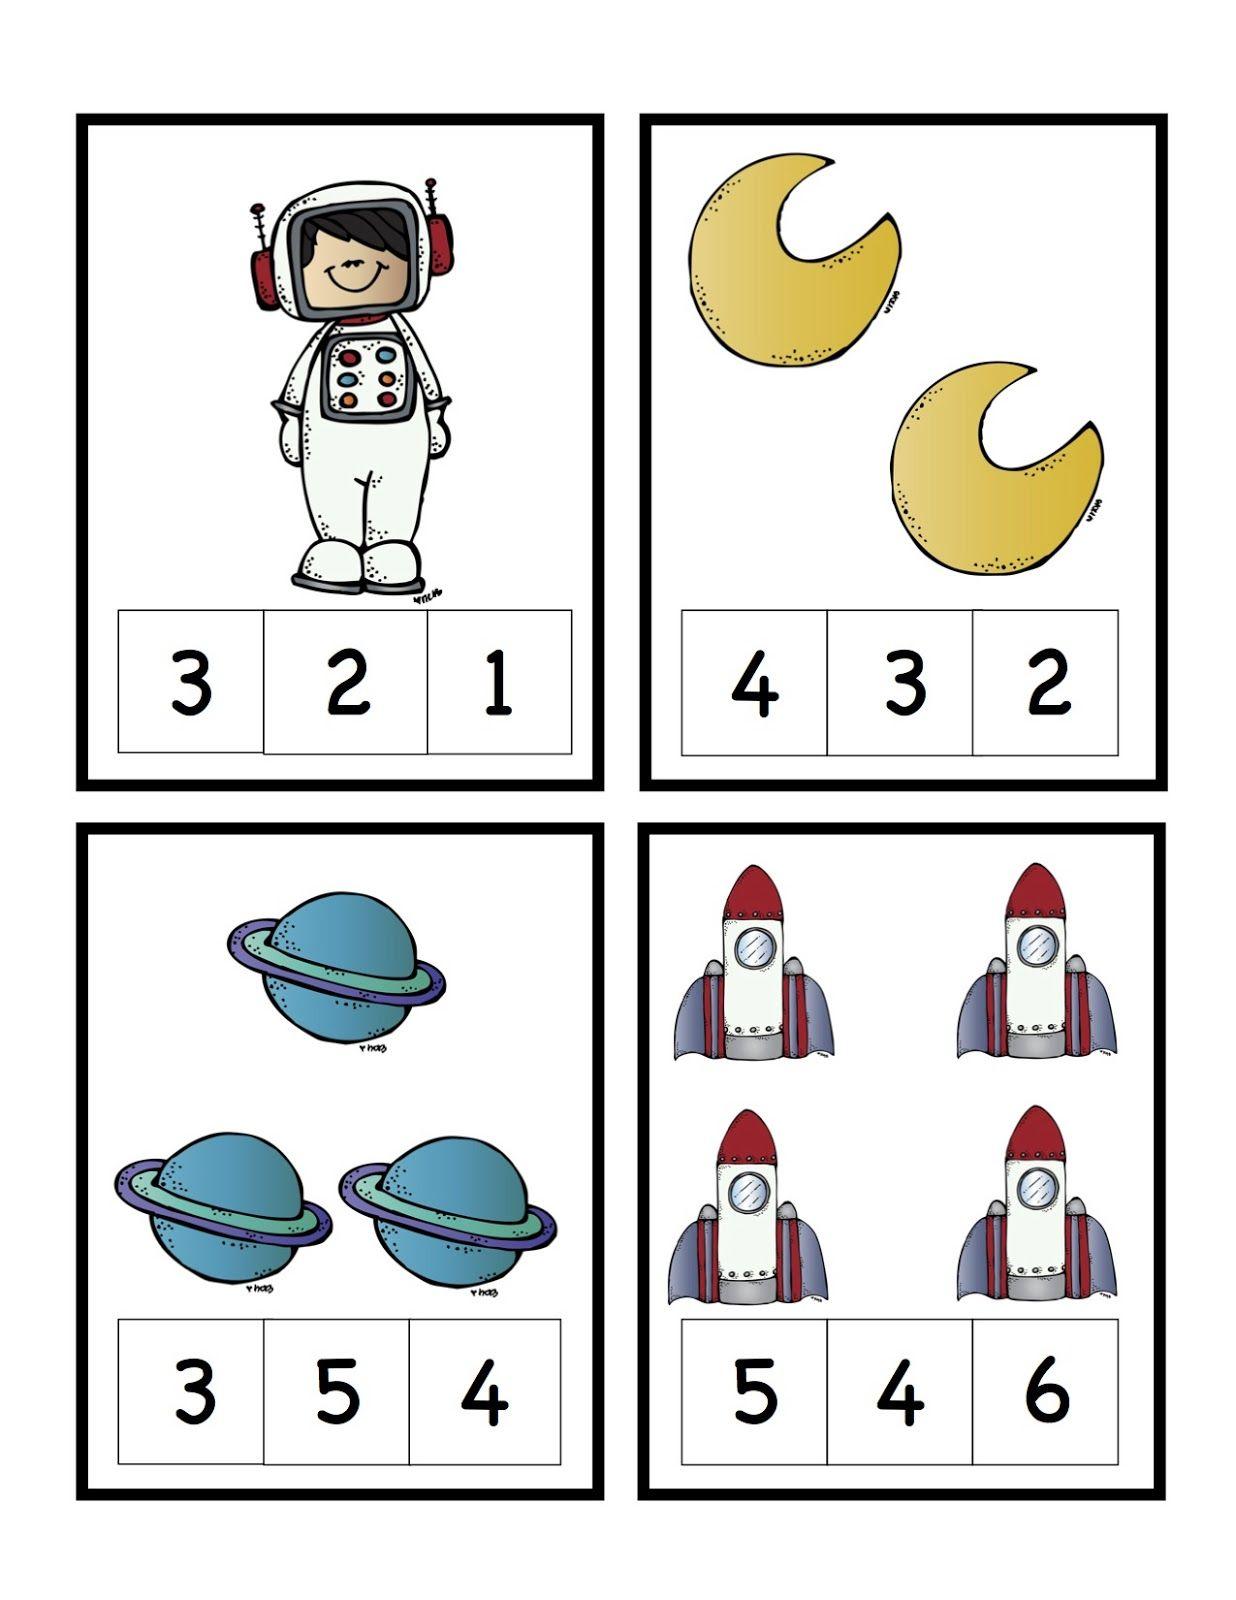 Free Preschool Rocket Countdown Math Worksheet Preschool Rocket Fun Math Worksheets Math Worksheet [ 1024 x 791 Pixel ]